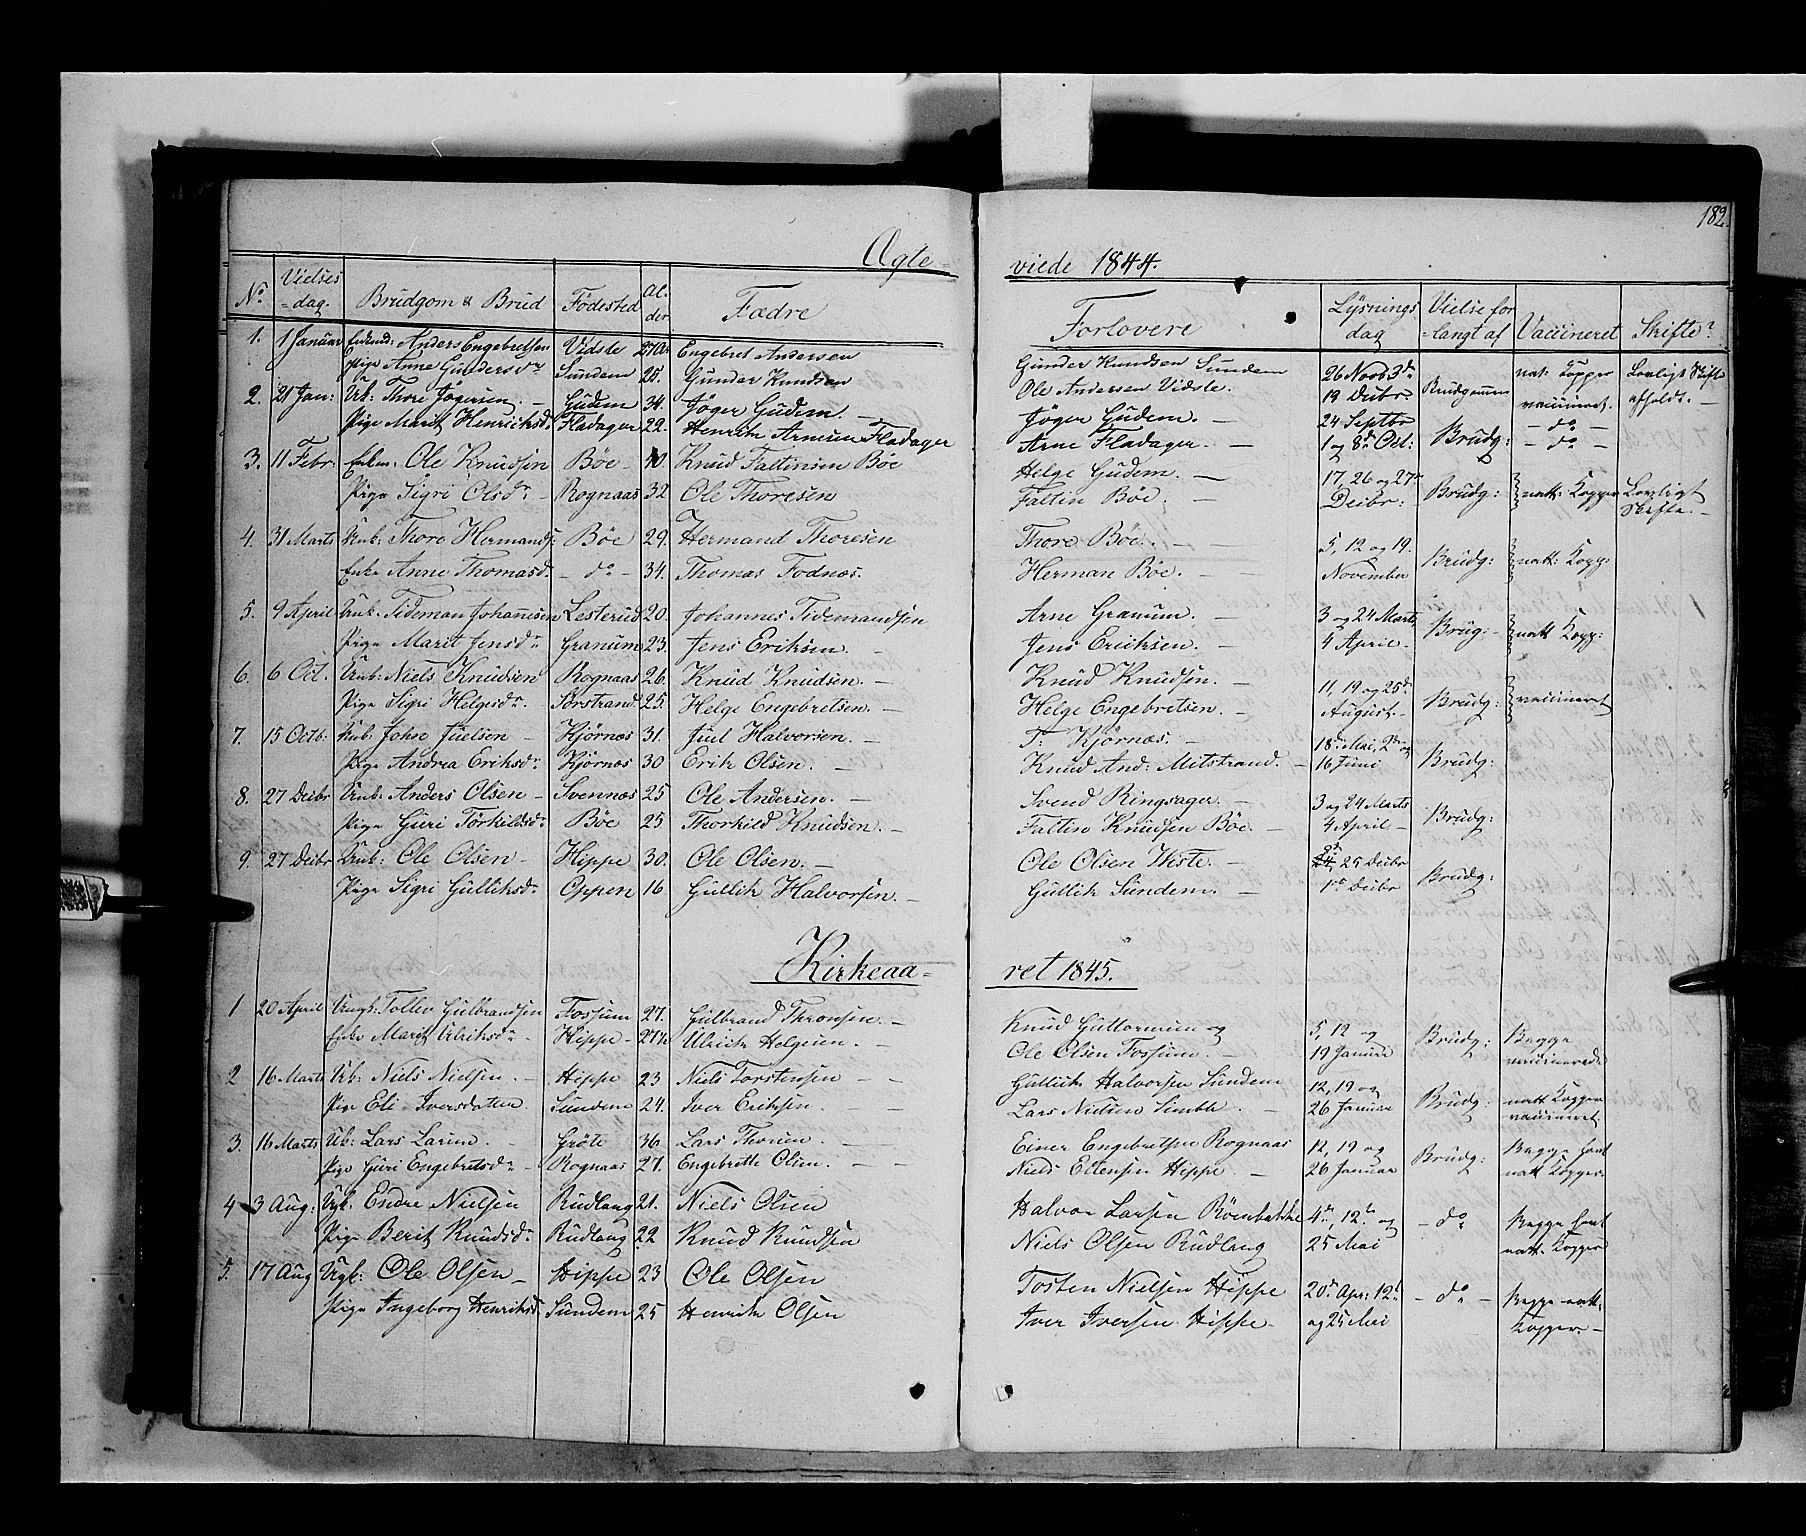 SAH, Nord-Aurdal prestekontor, Ministerialbok nr. 6, 1842-1863, s. 182